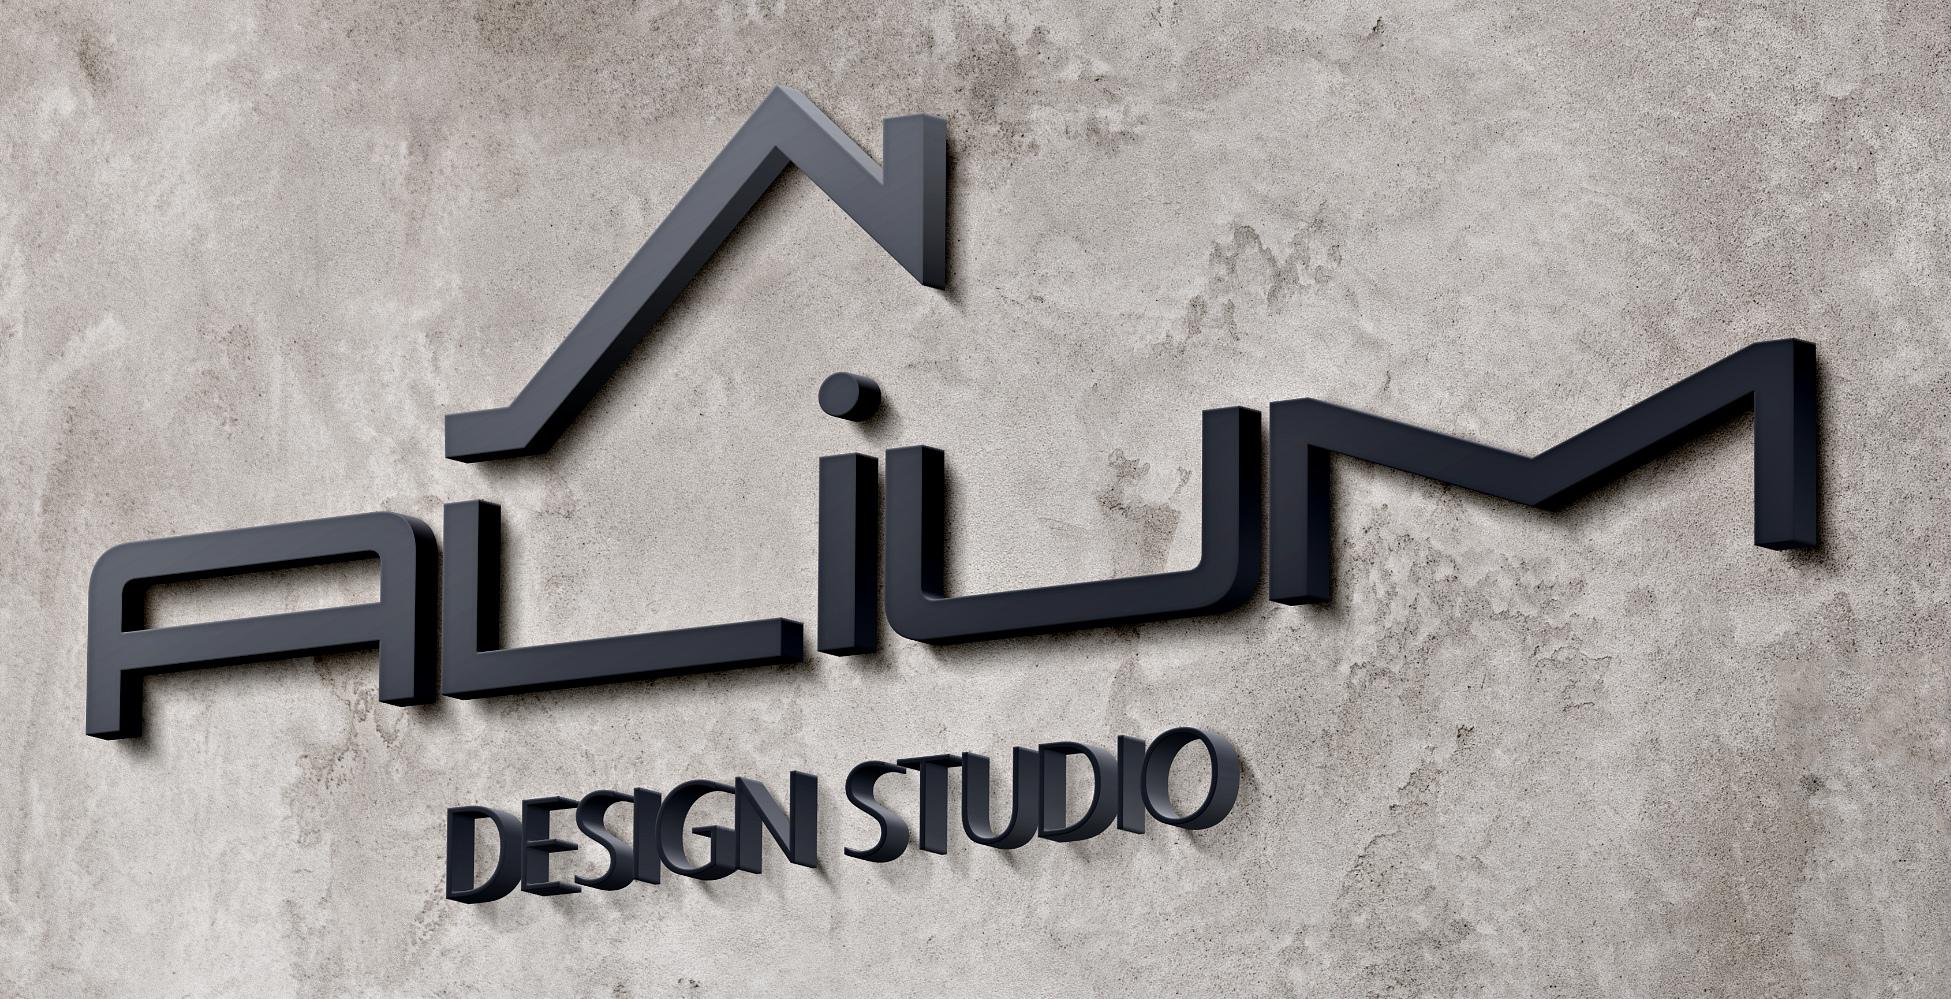 Логотип для дизайн студии фото f_03159e9e69e5ae7c.jpg